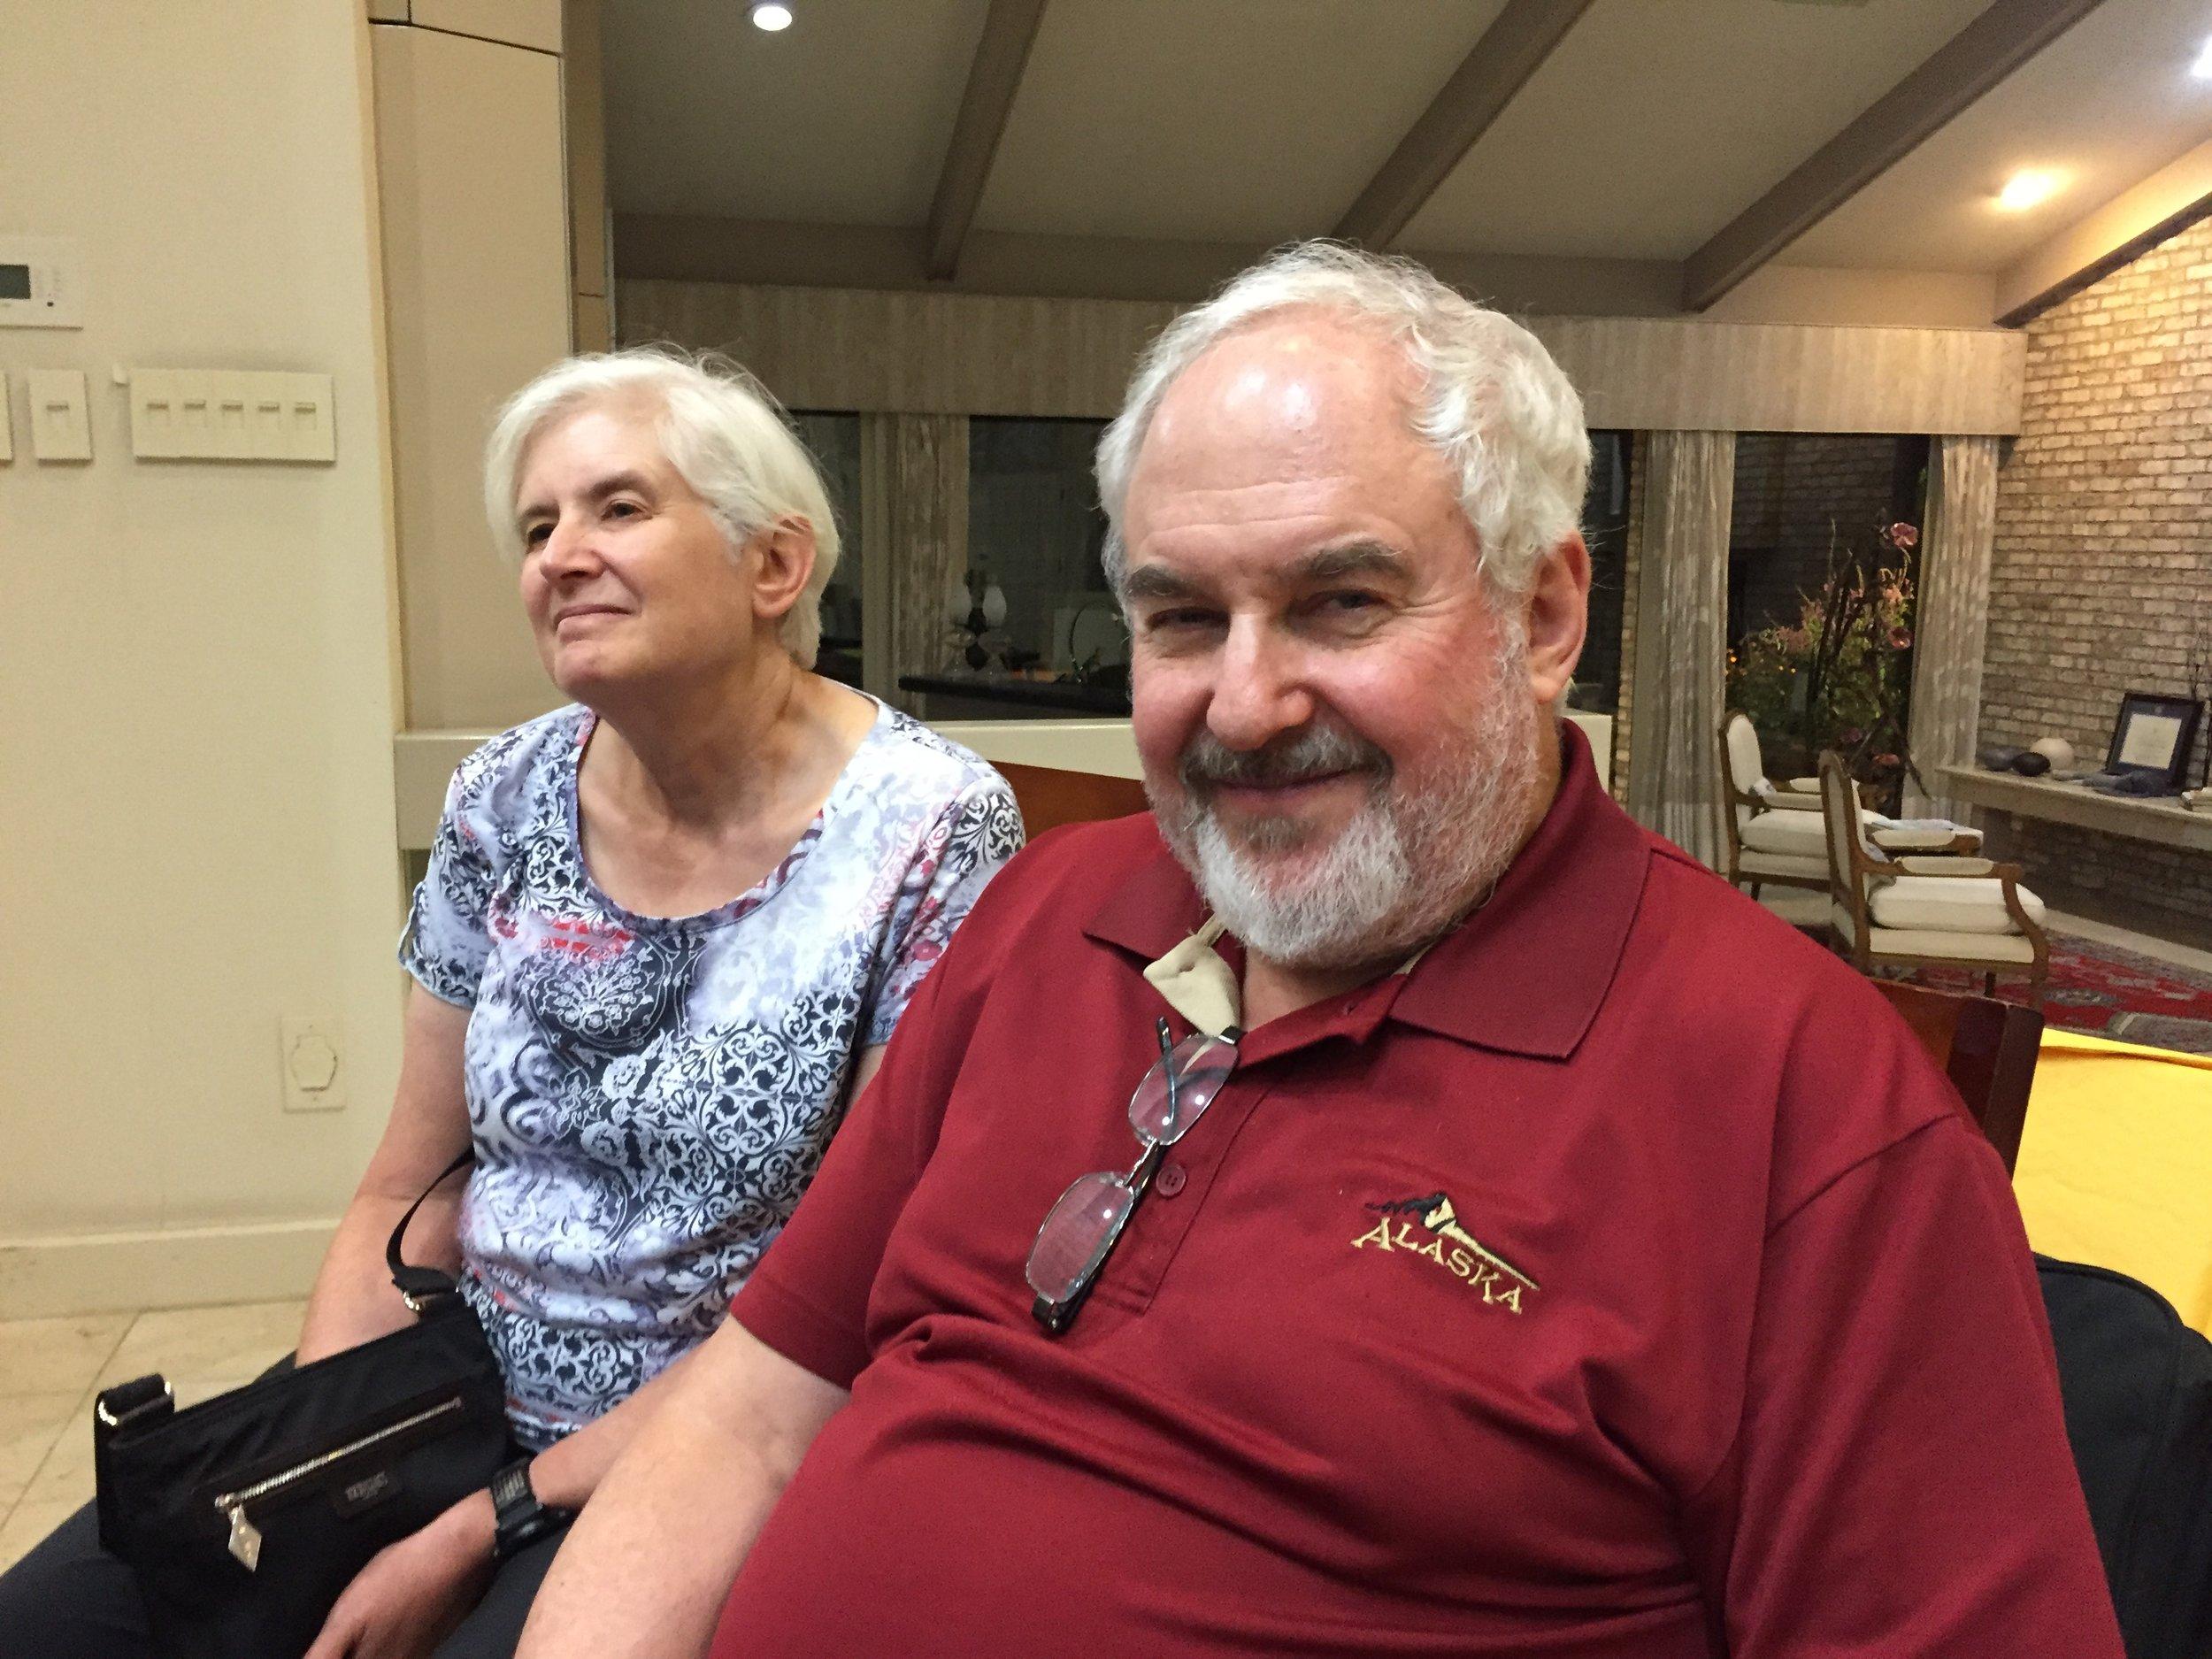 Lee Goodwin and Linda Schwartzstein